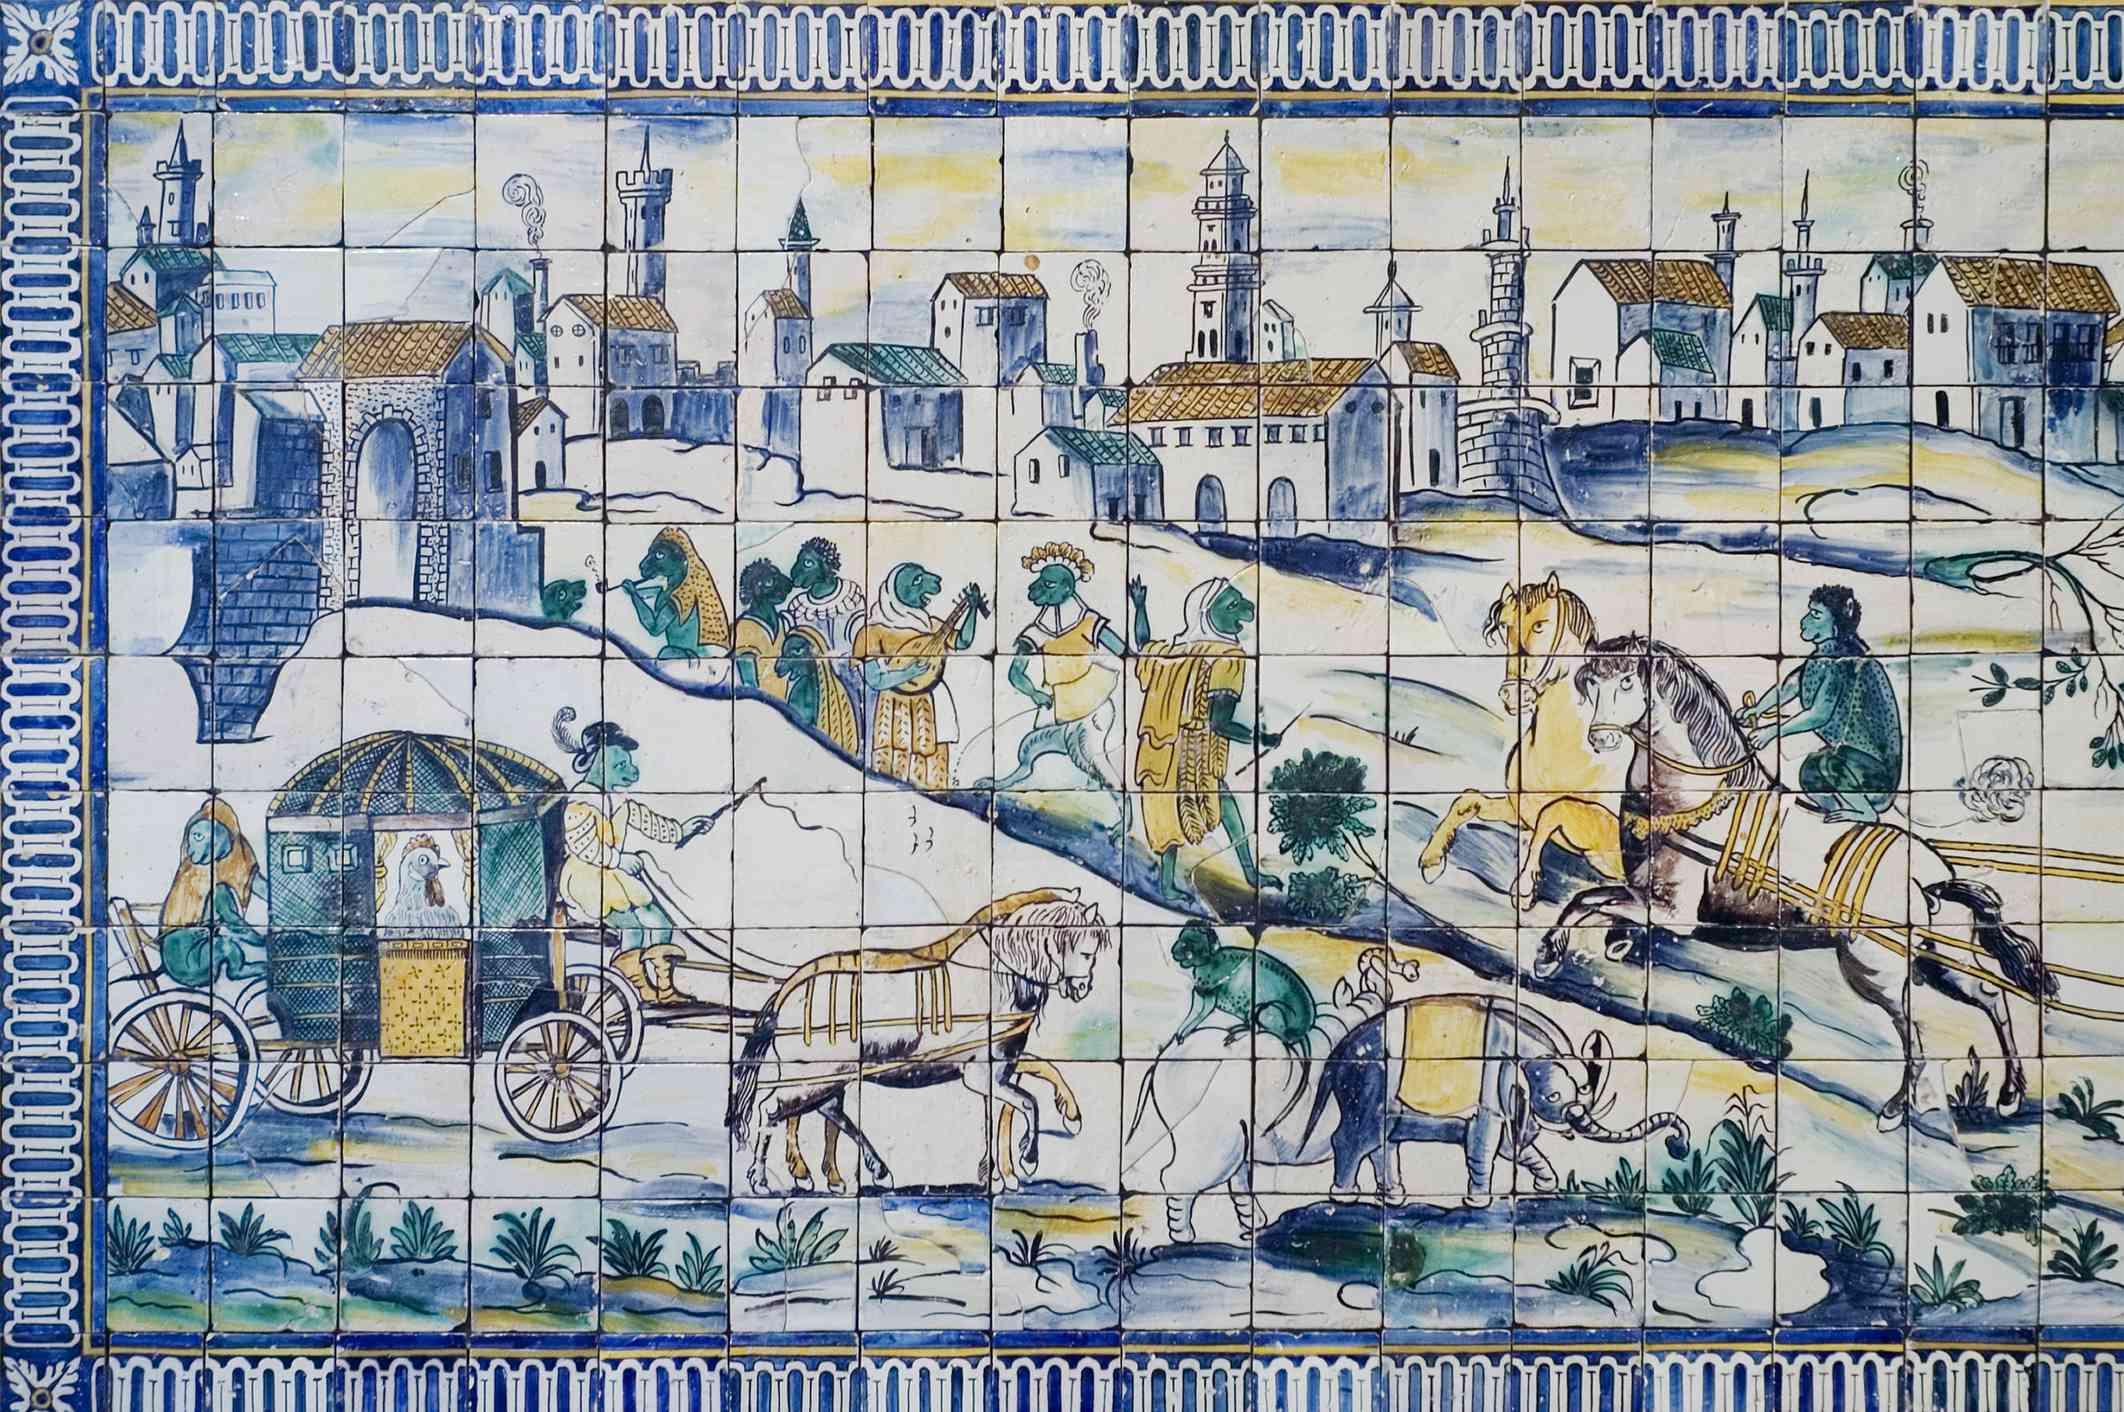 Tilework in Museu Nacional do Azulejo